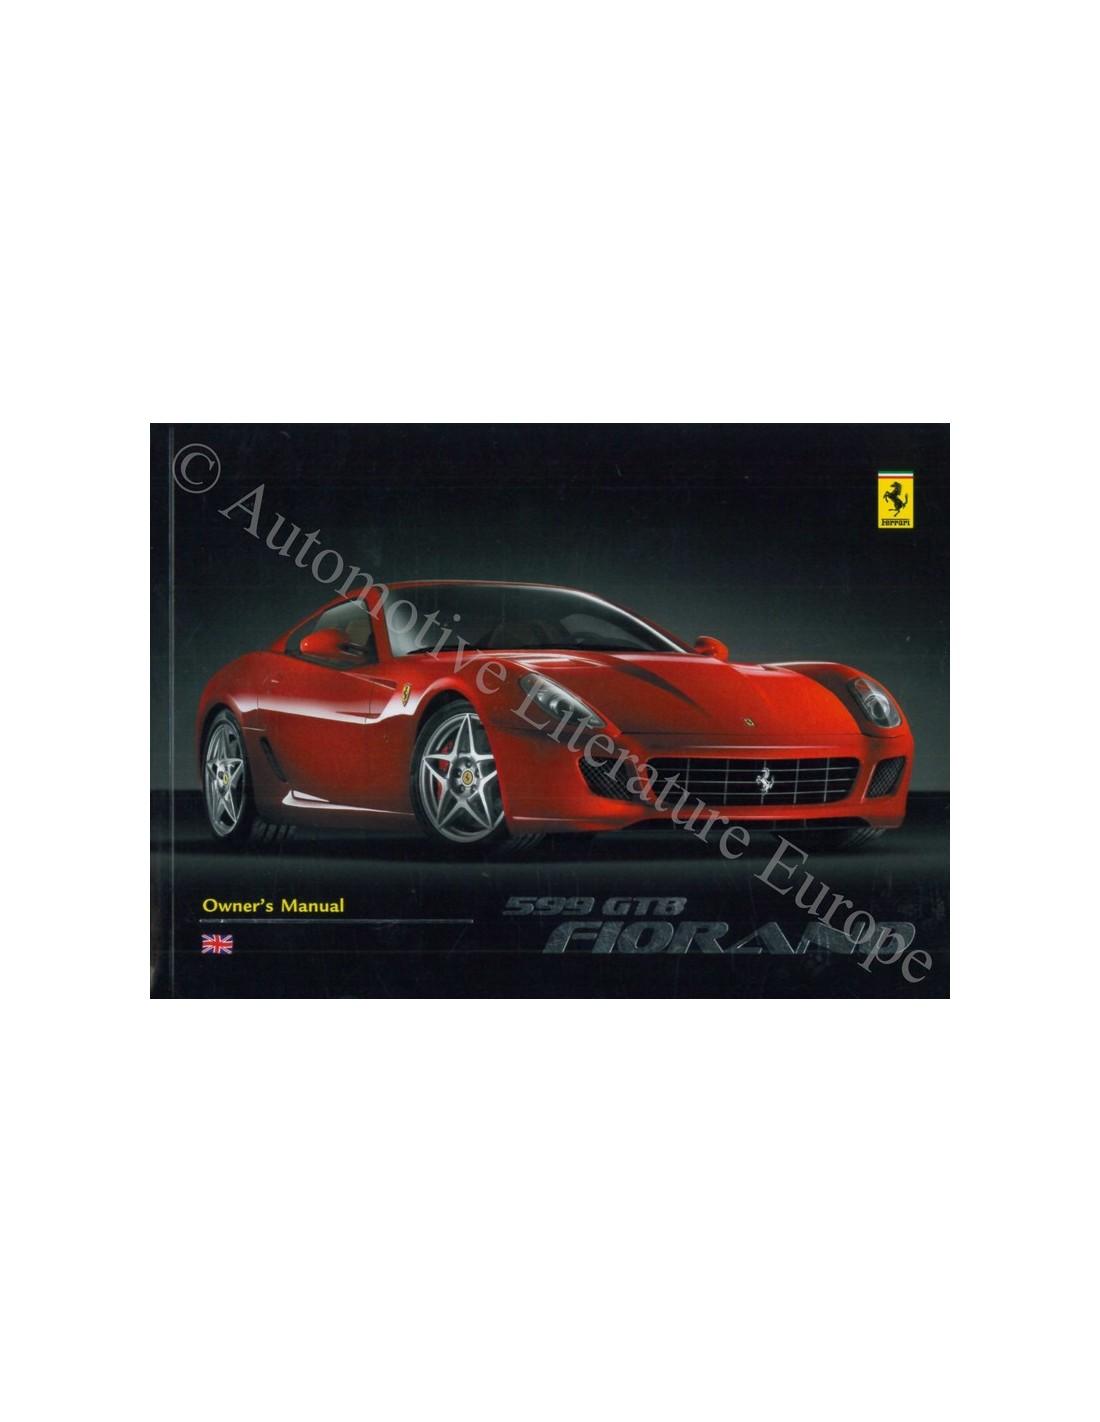 2009 FERRARI 599 GTB FIORANO OWNERS MANUAL ENGLISH